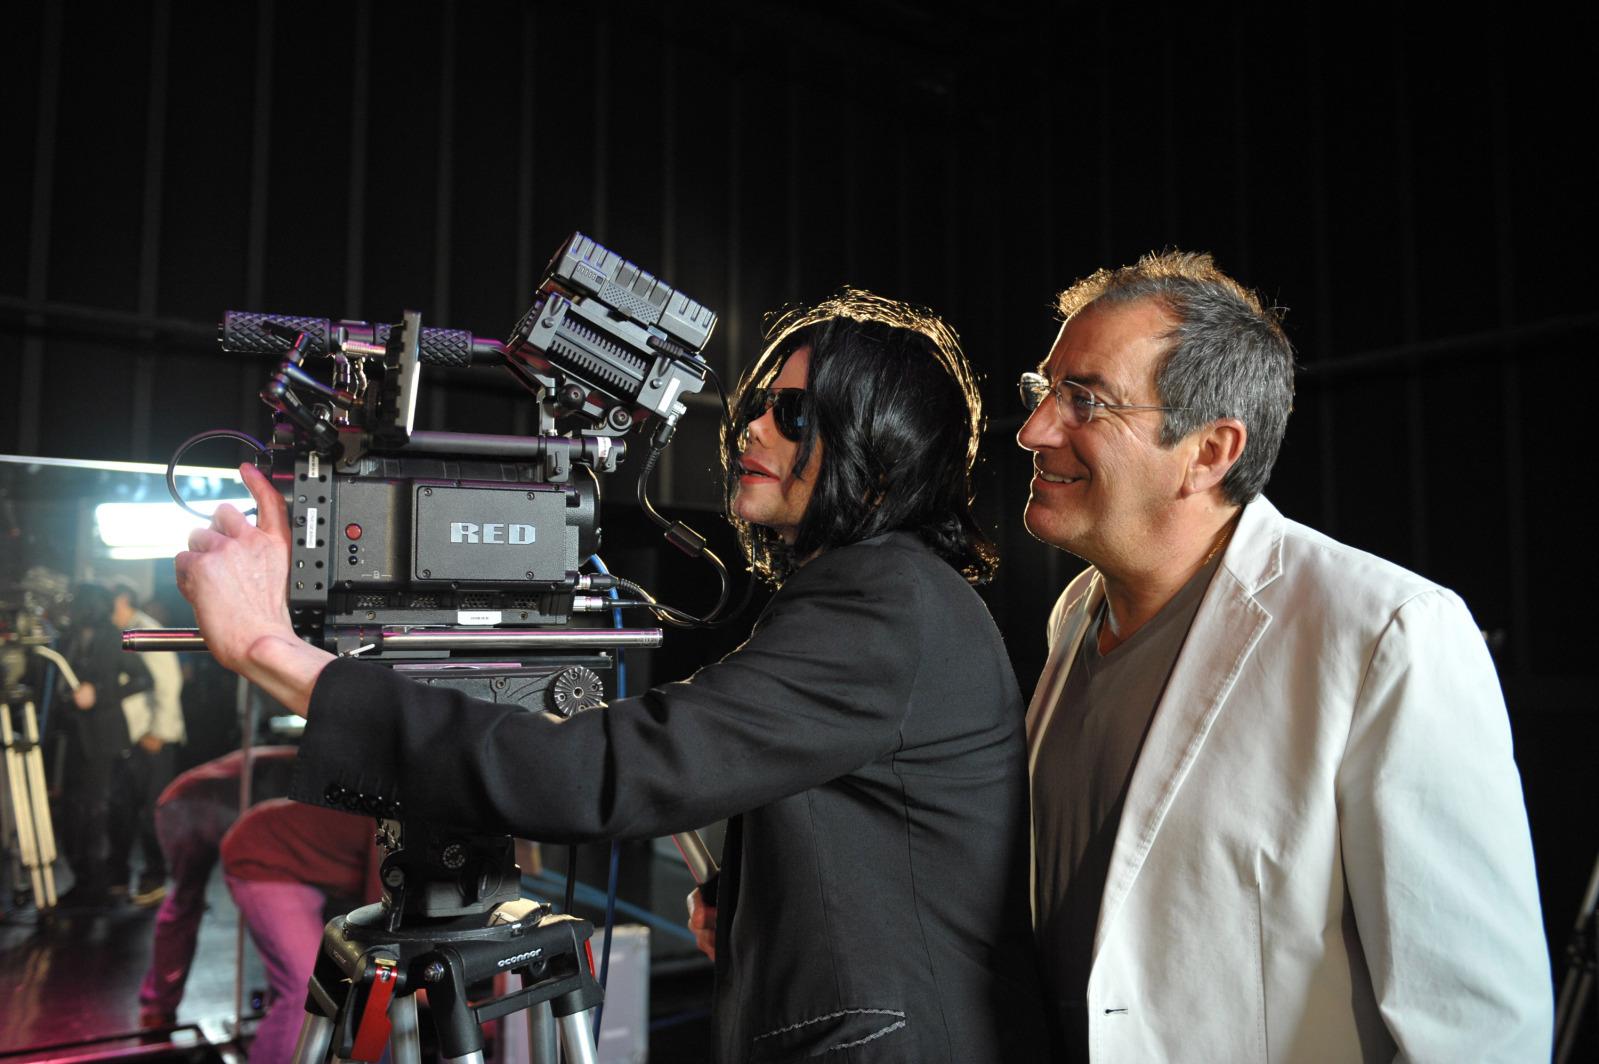 http://4.bp.blogspot.com/__iuYbs5zGVw/TRbVOPYUtgI/AAAAAAAAASA/f7XN0qJUeGY/s1600/michael-jackson-this-is-it-camera.jpg